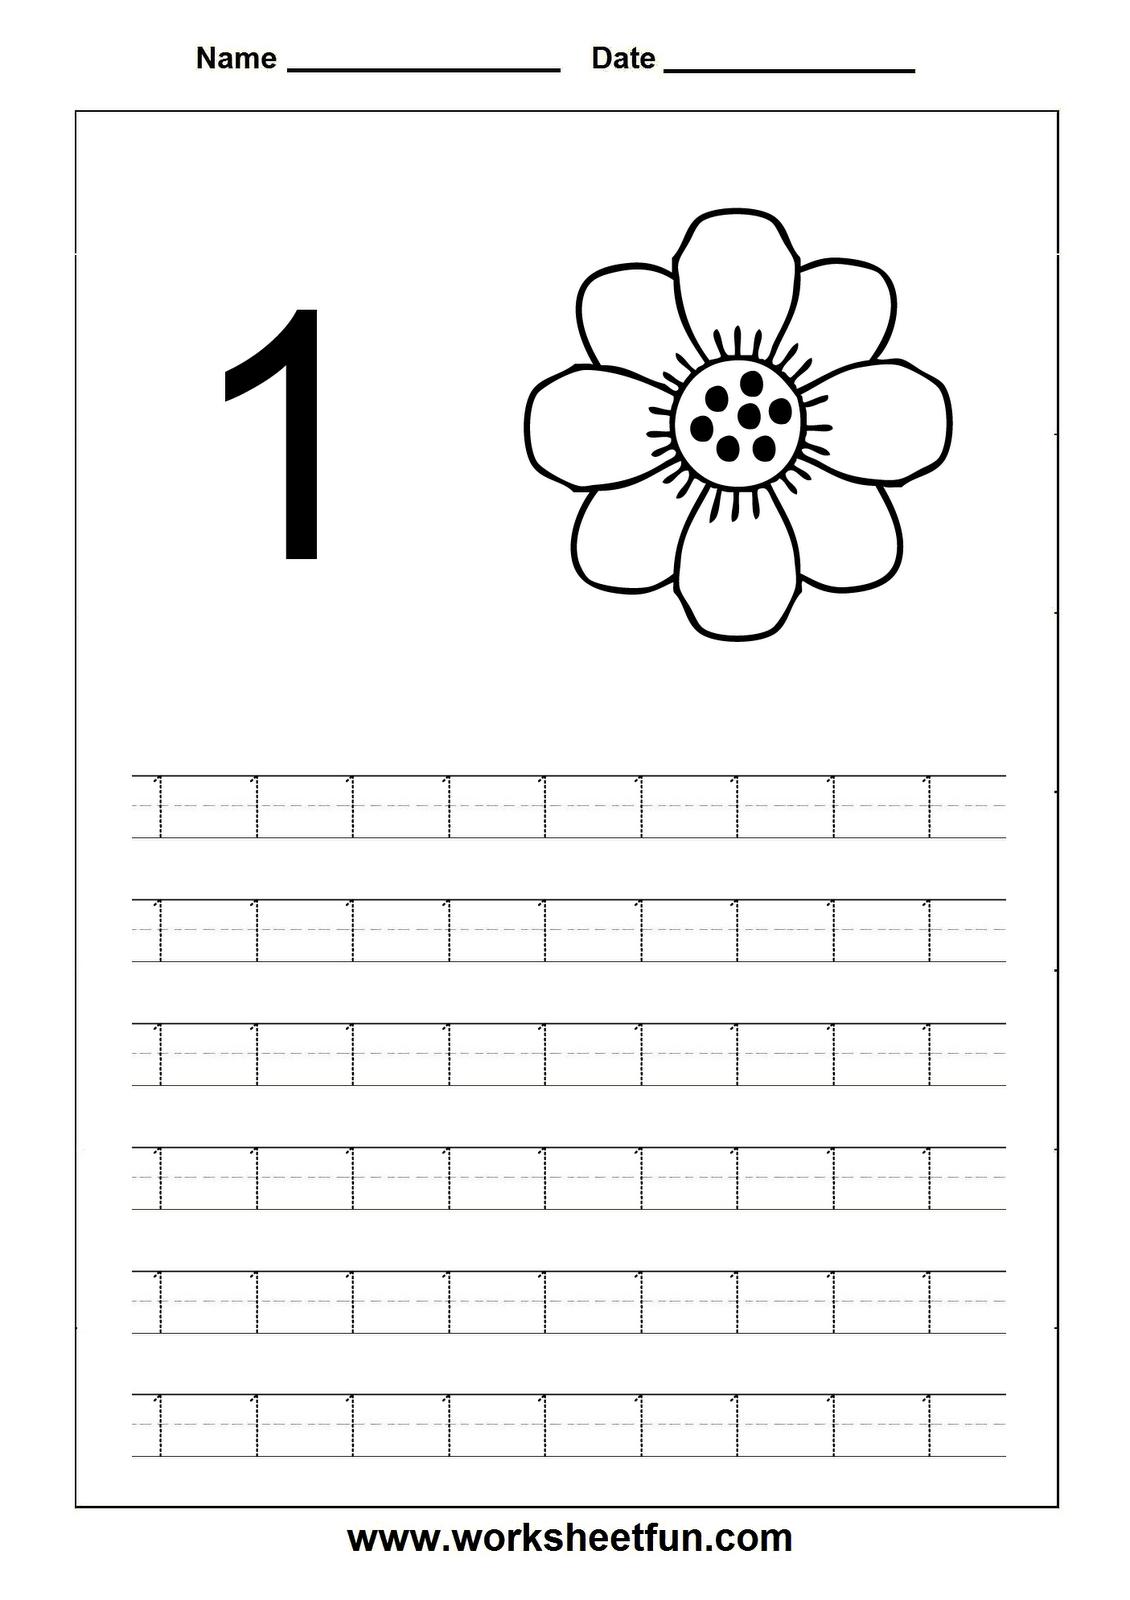 Number Tracing Worksheets For Kindergarten And Preschool inside Tracing Letter 1